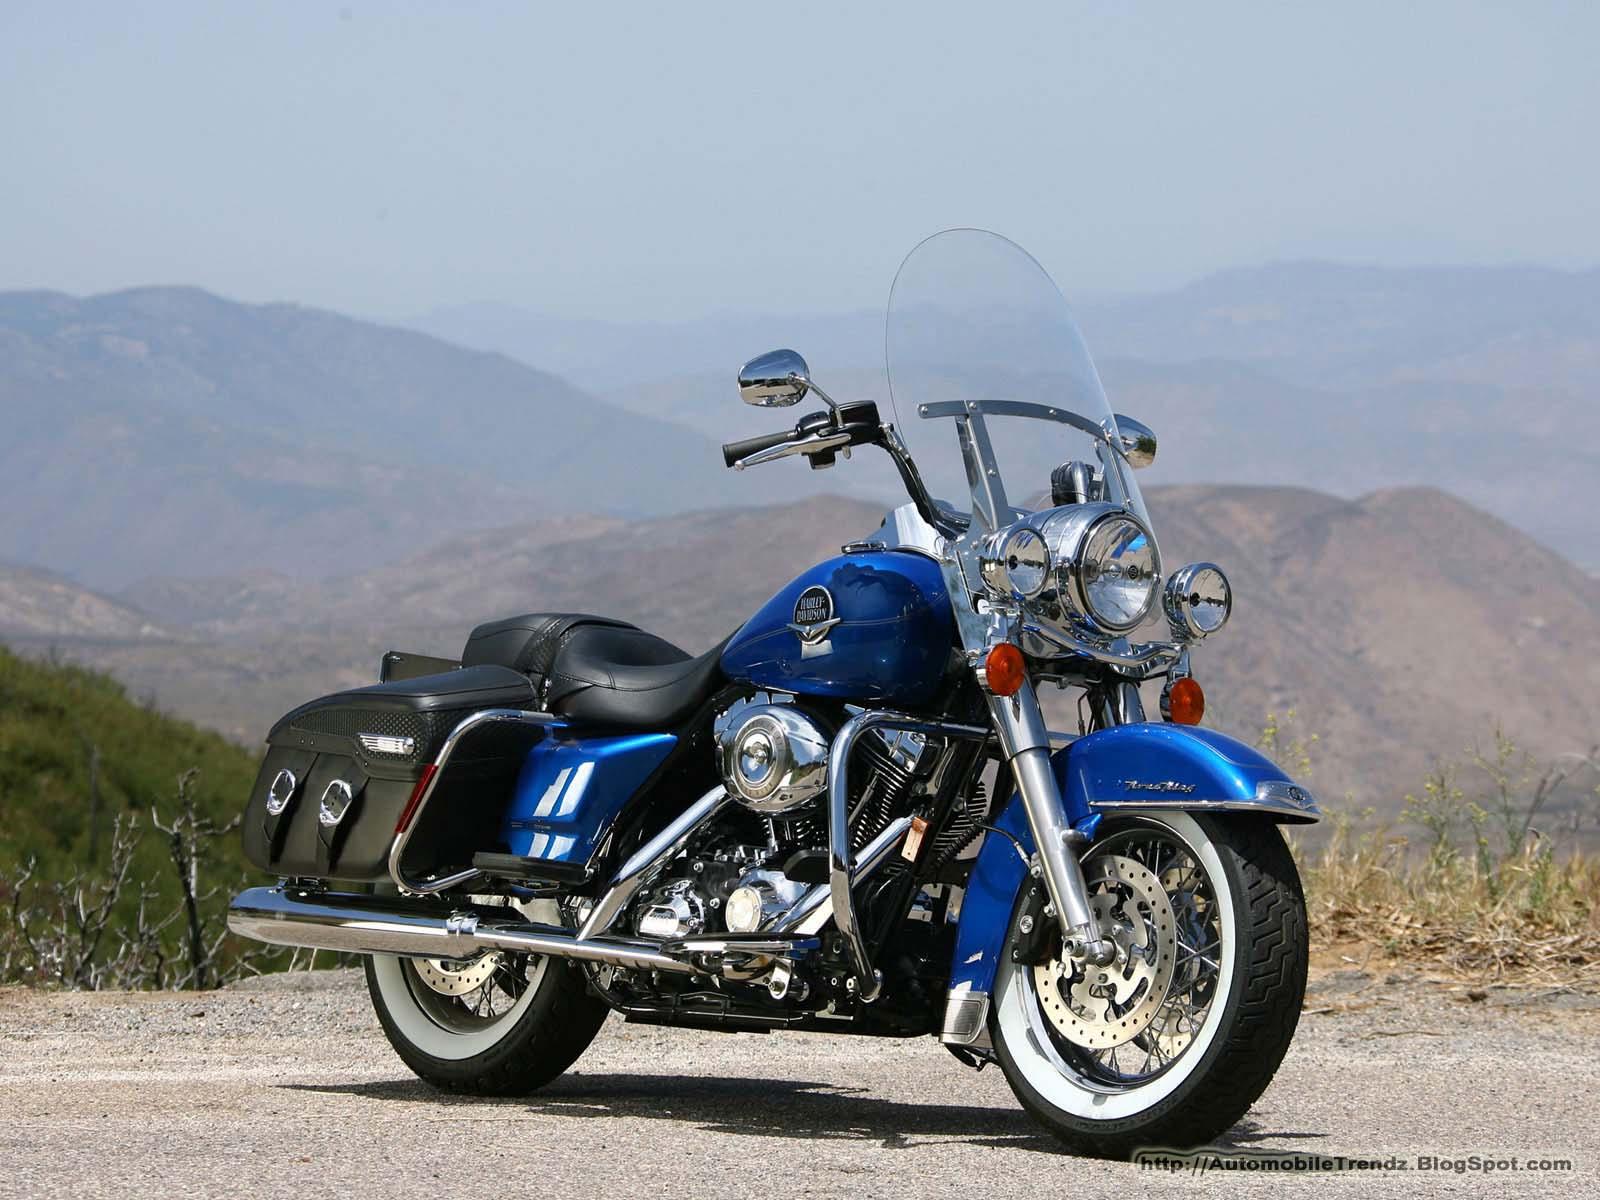 Automobile Trendz: Harley Davidson Road King